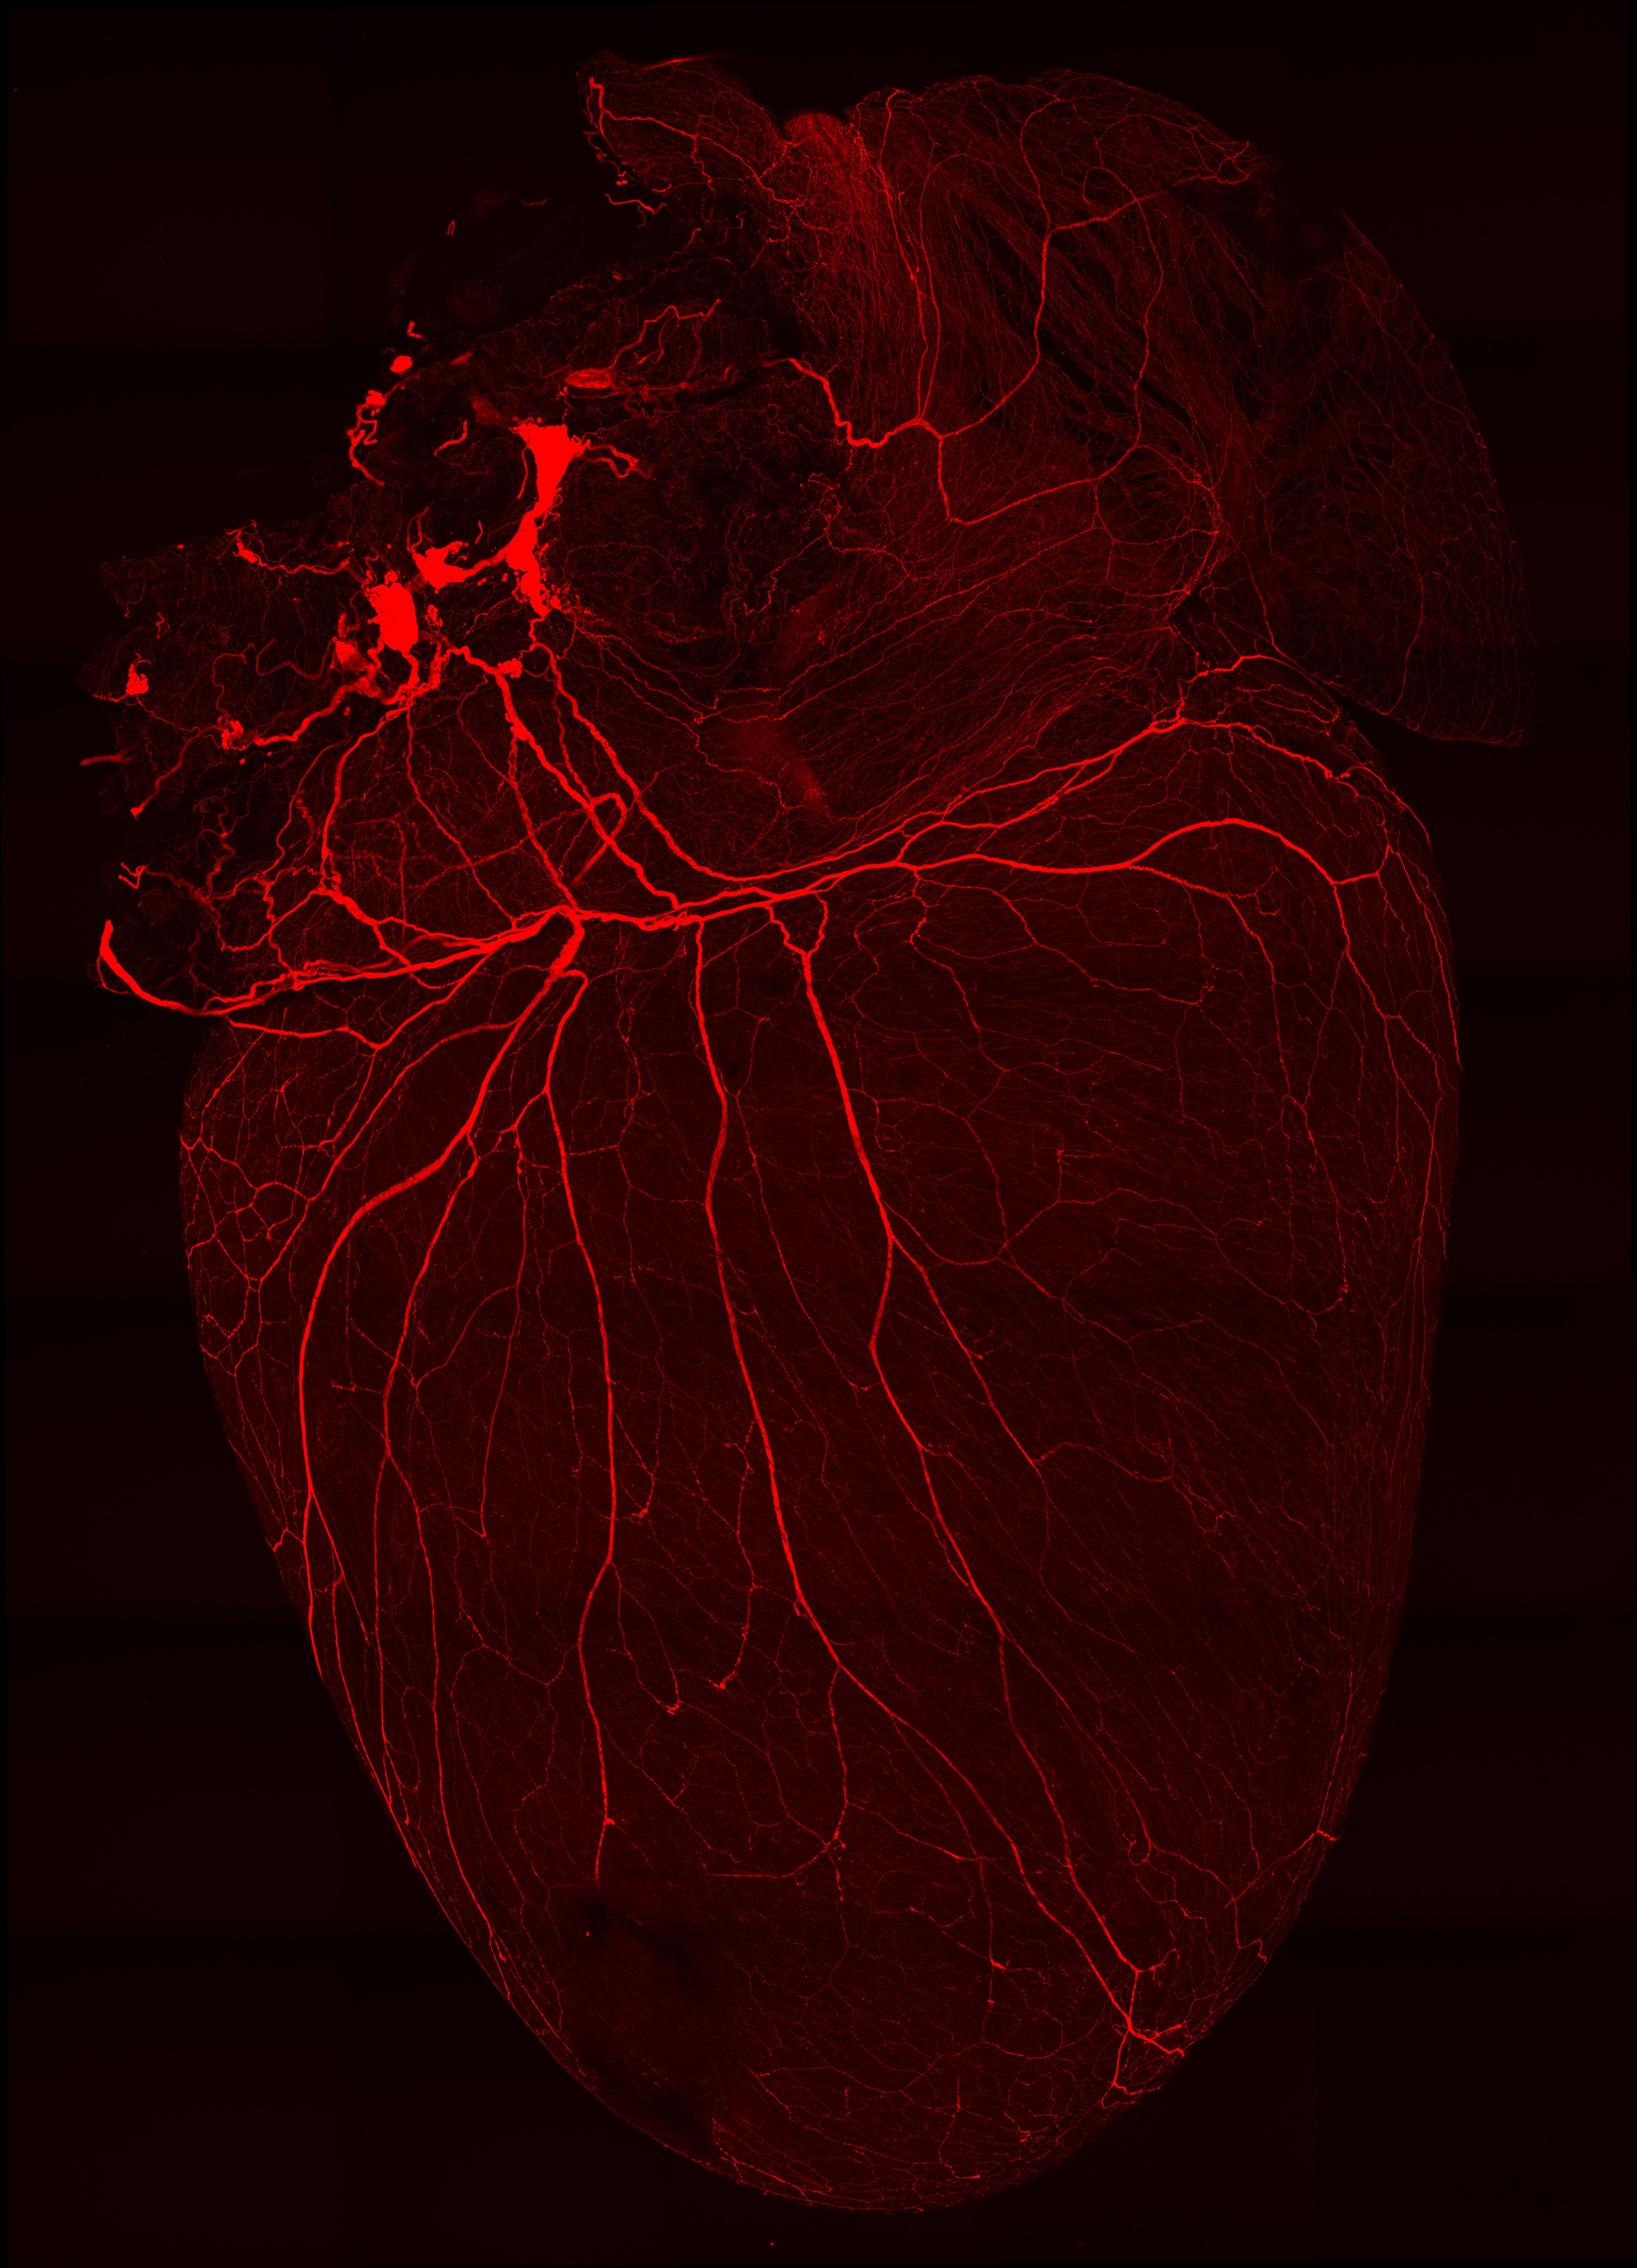 Nerves on the heart